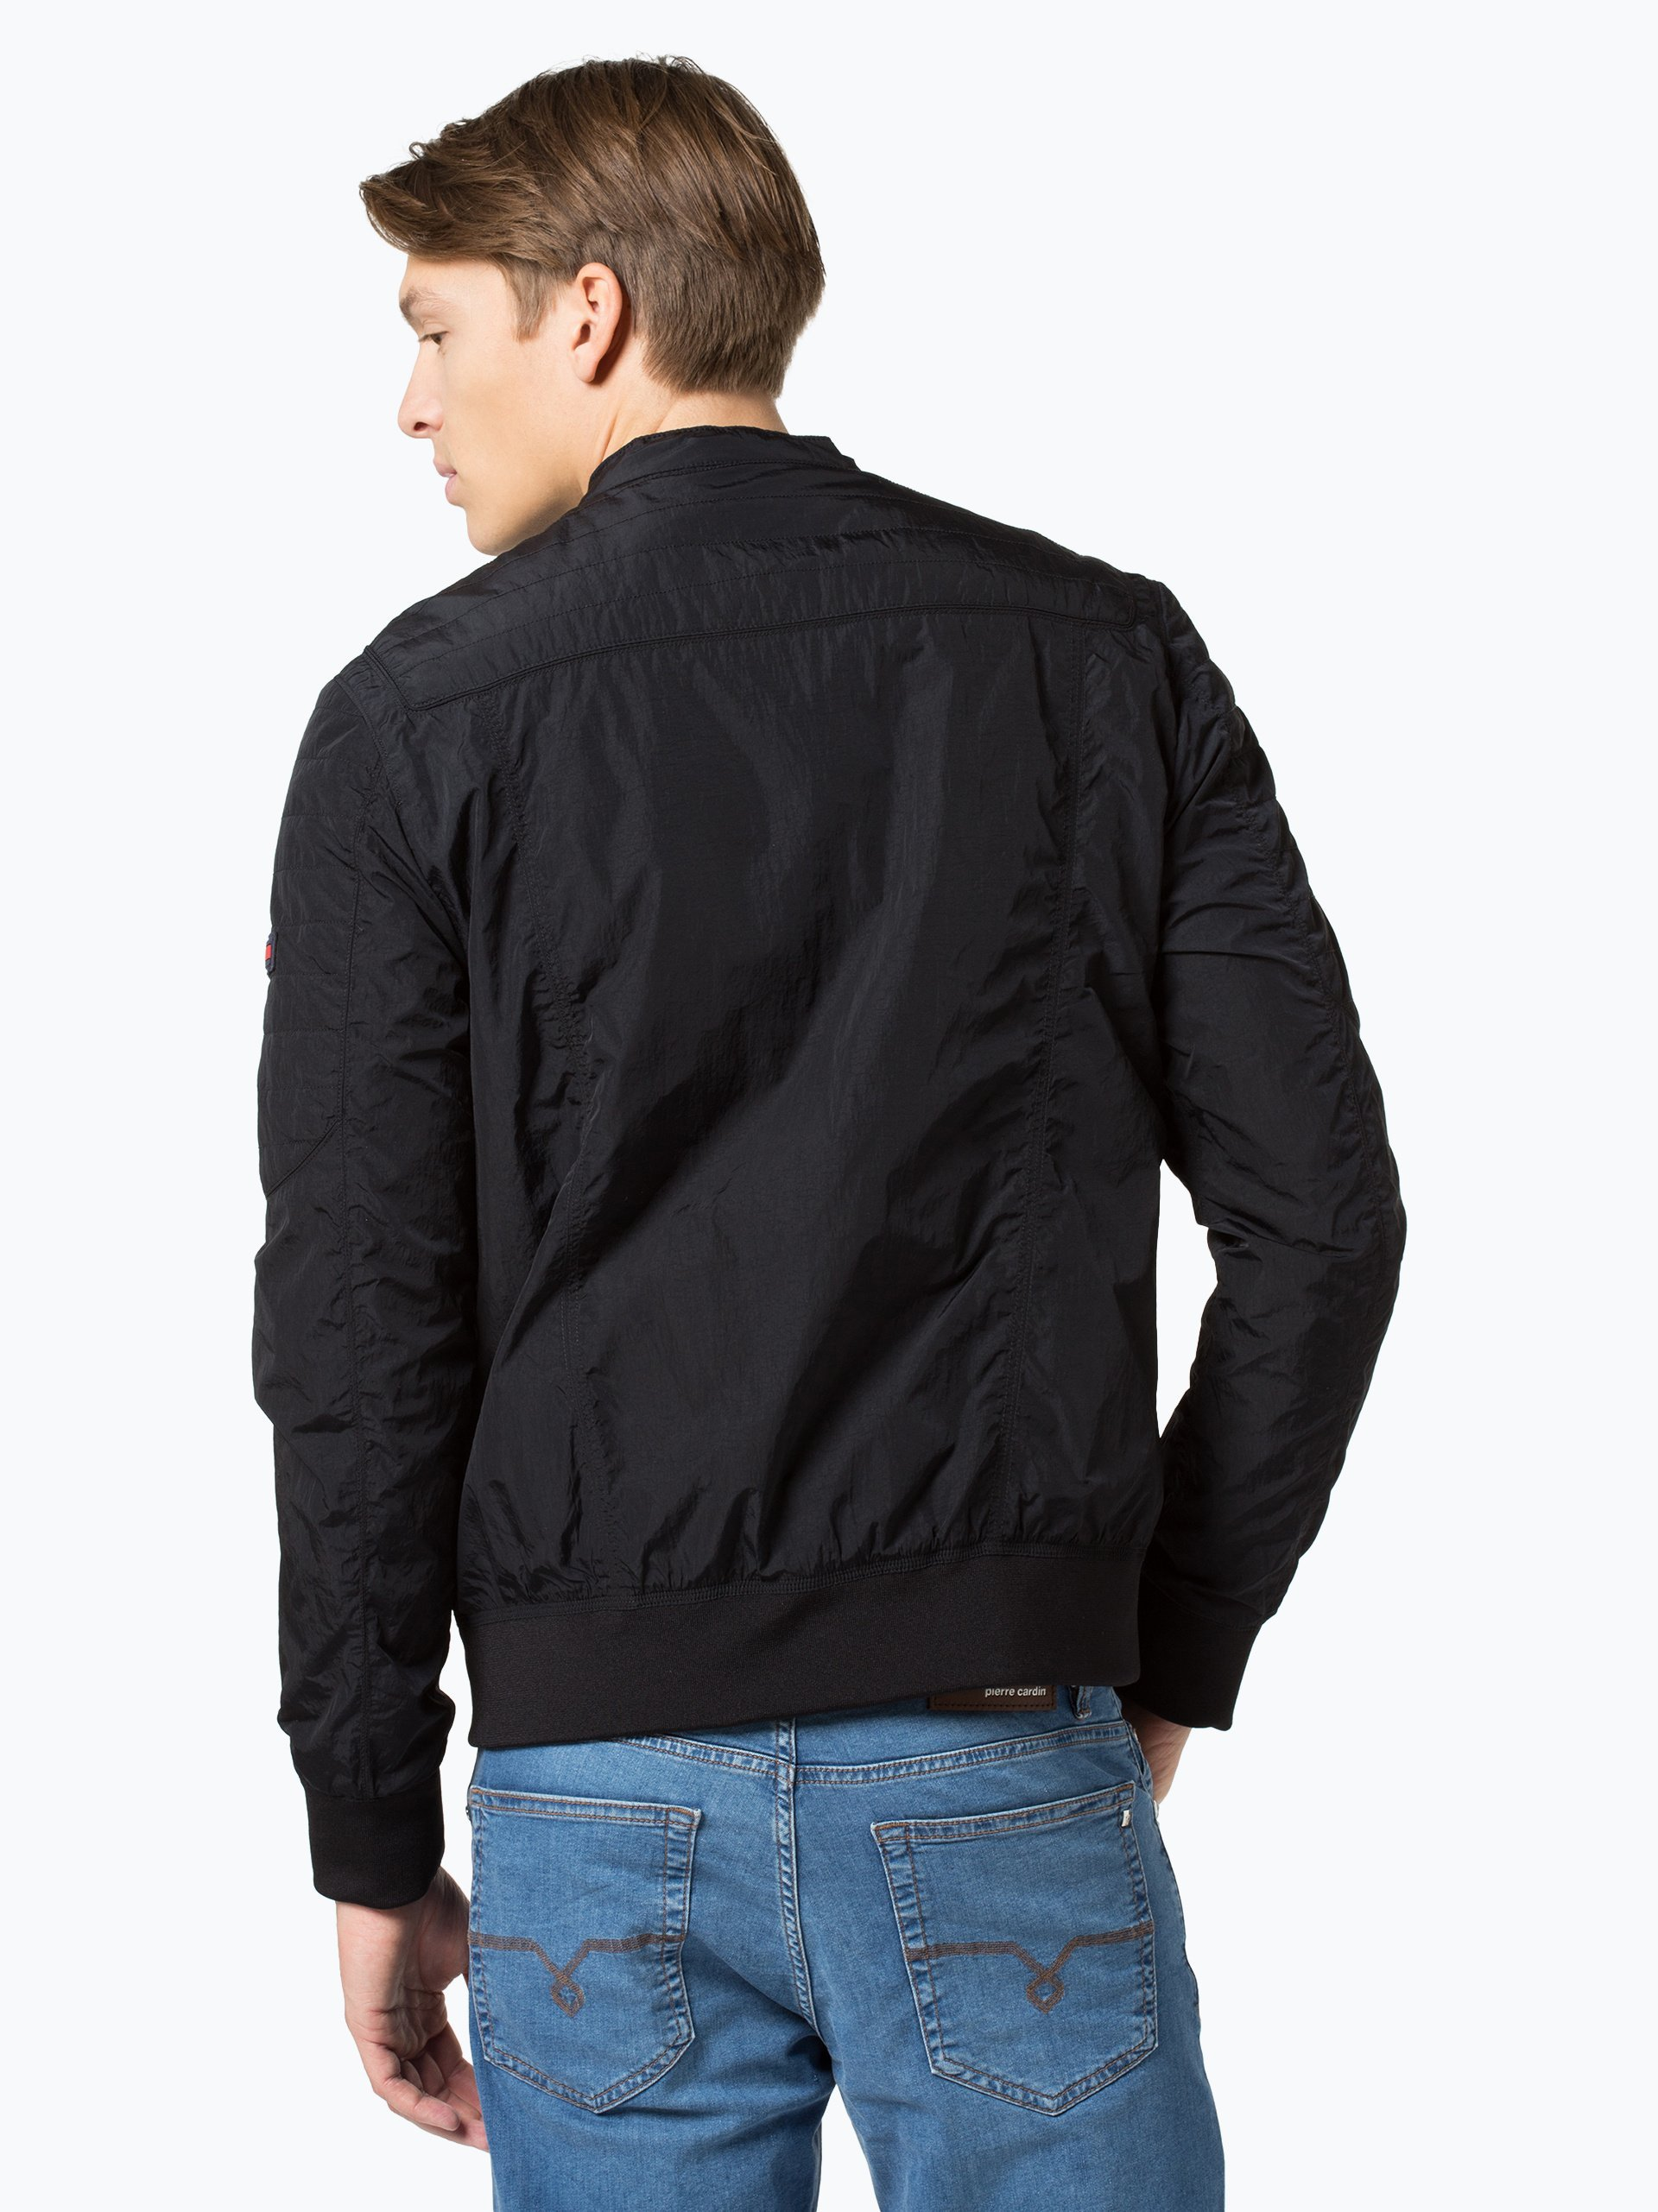 Tommy jeans herren jacke schwarz uni online kaufen for Garderobe jacke